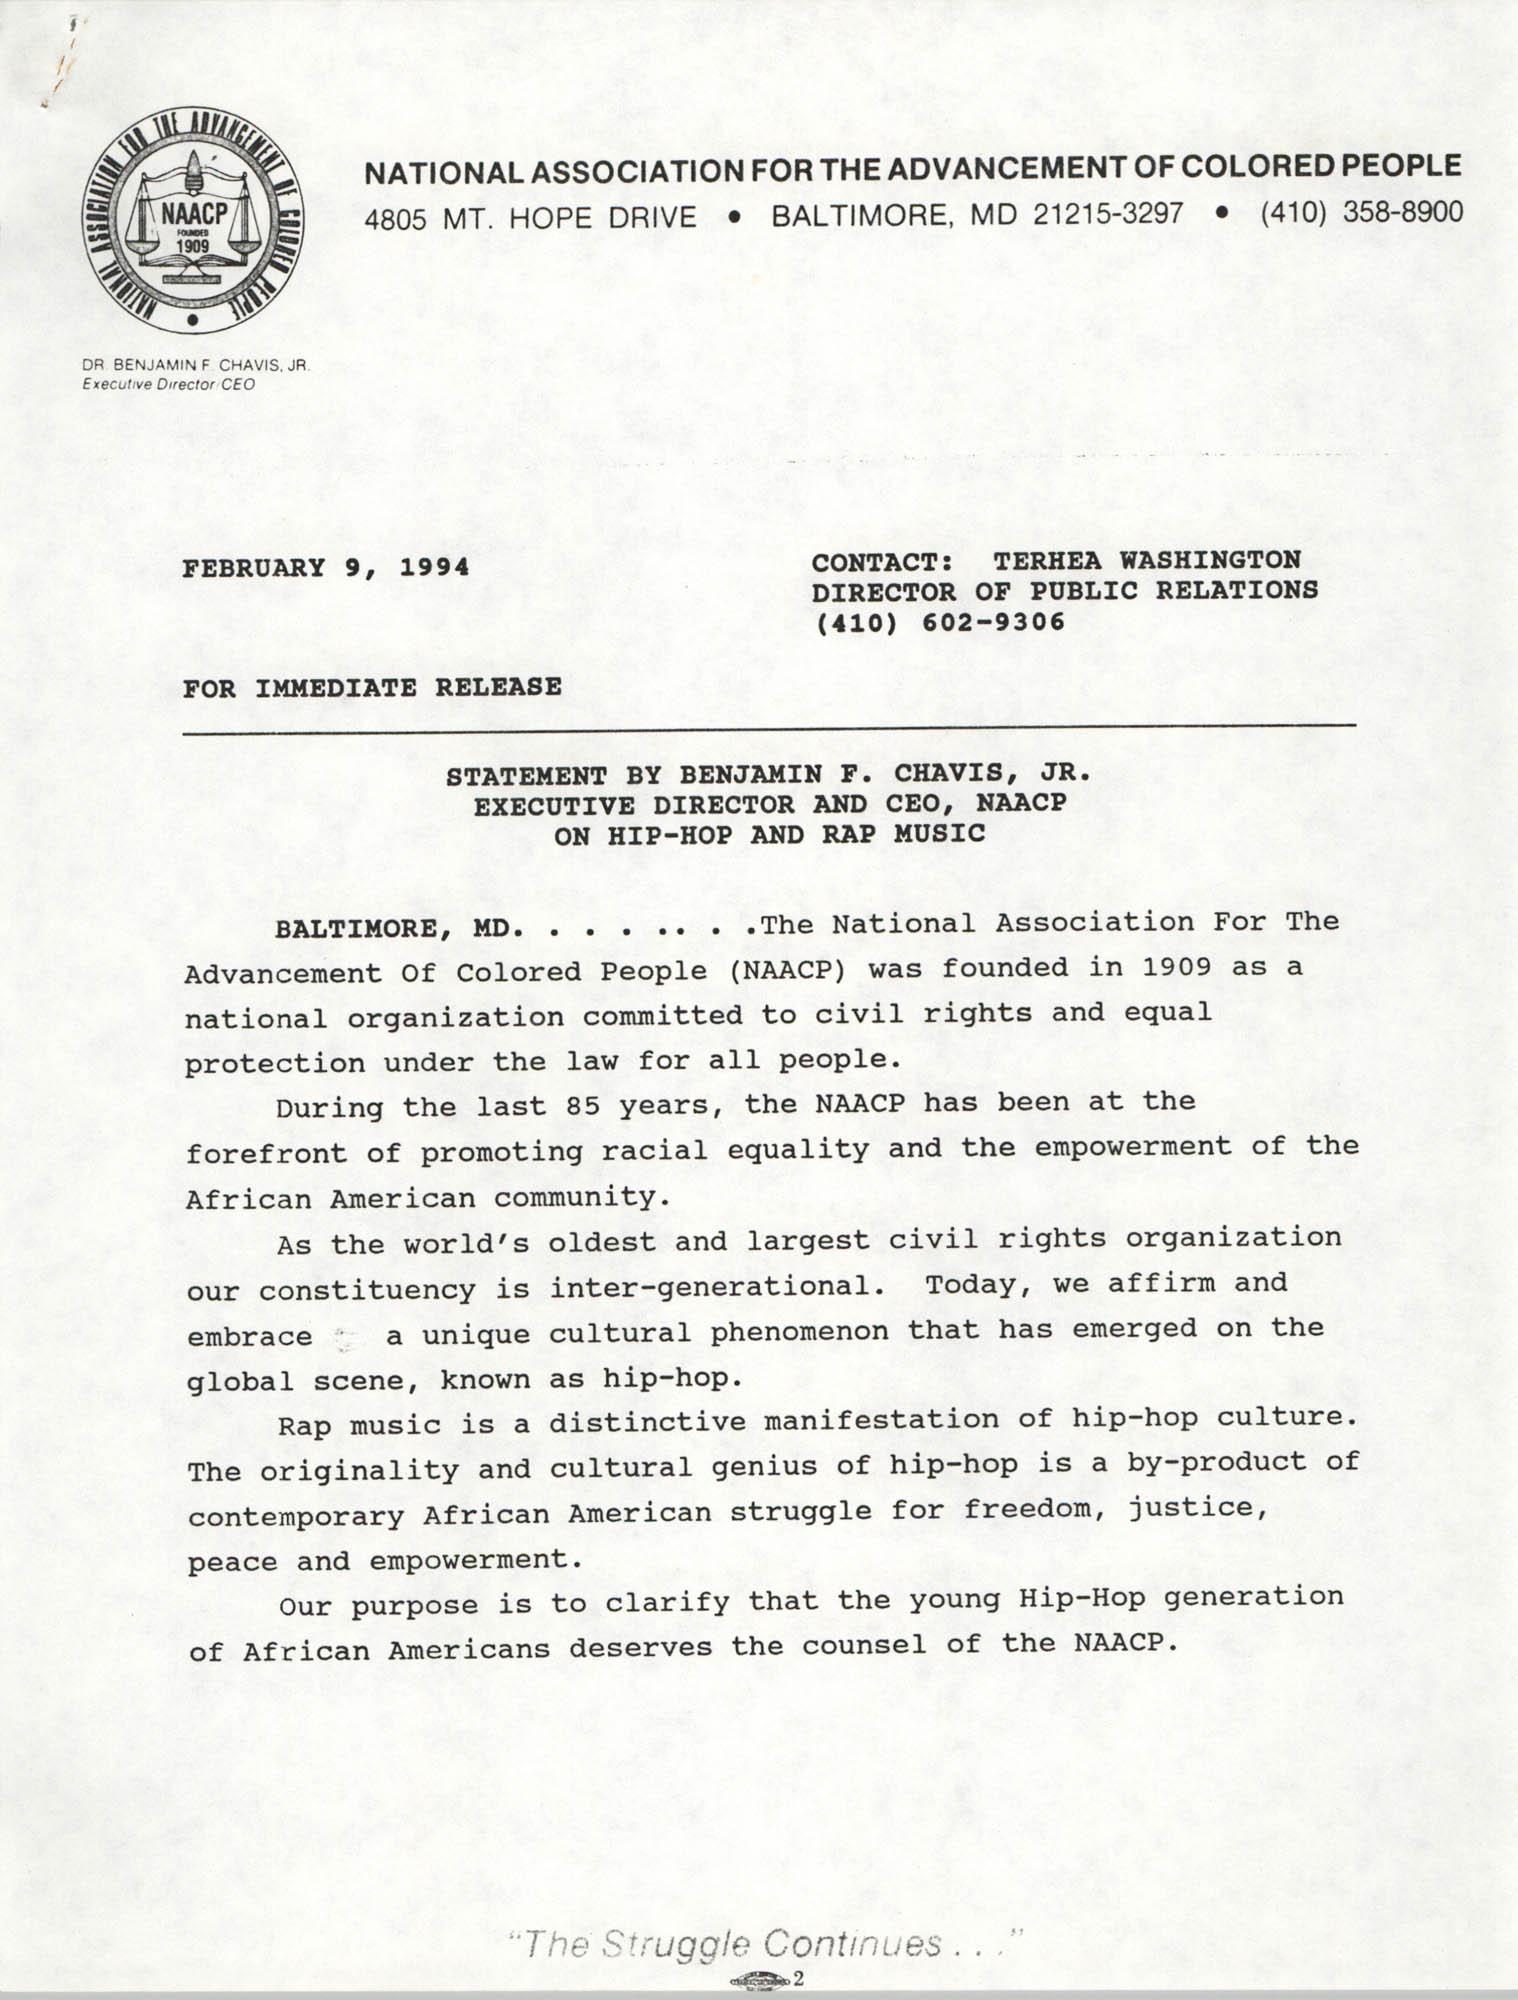 NAACP Press Release, February 9, 1994